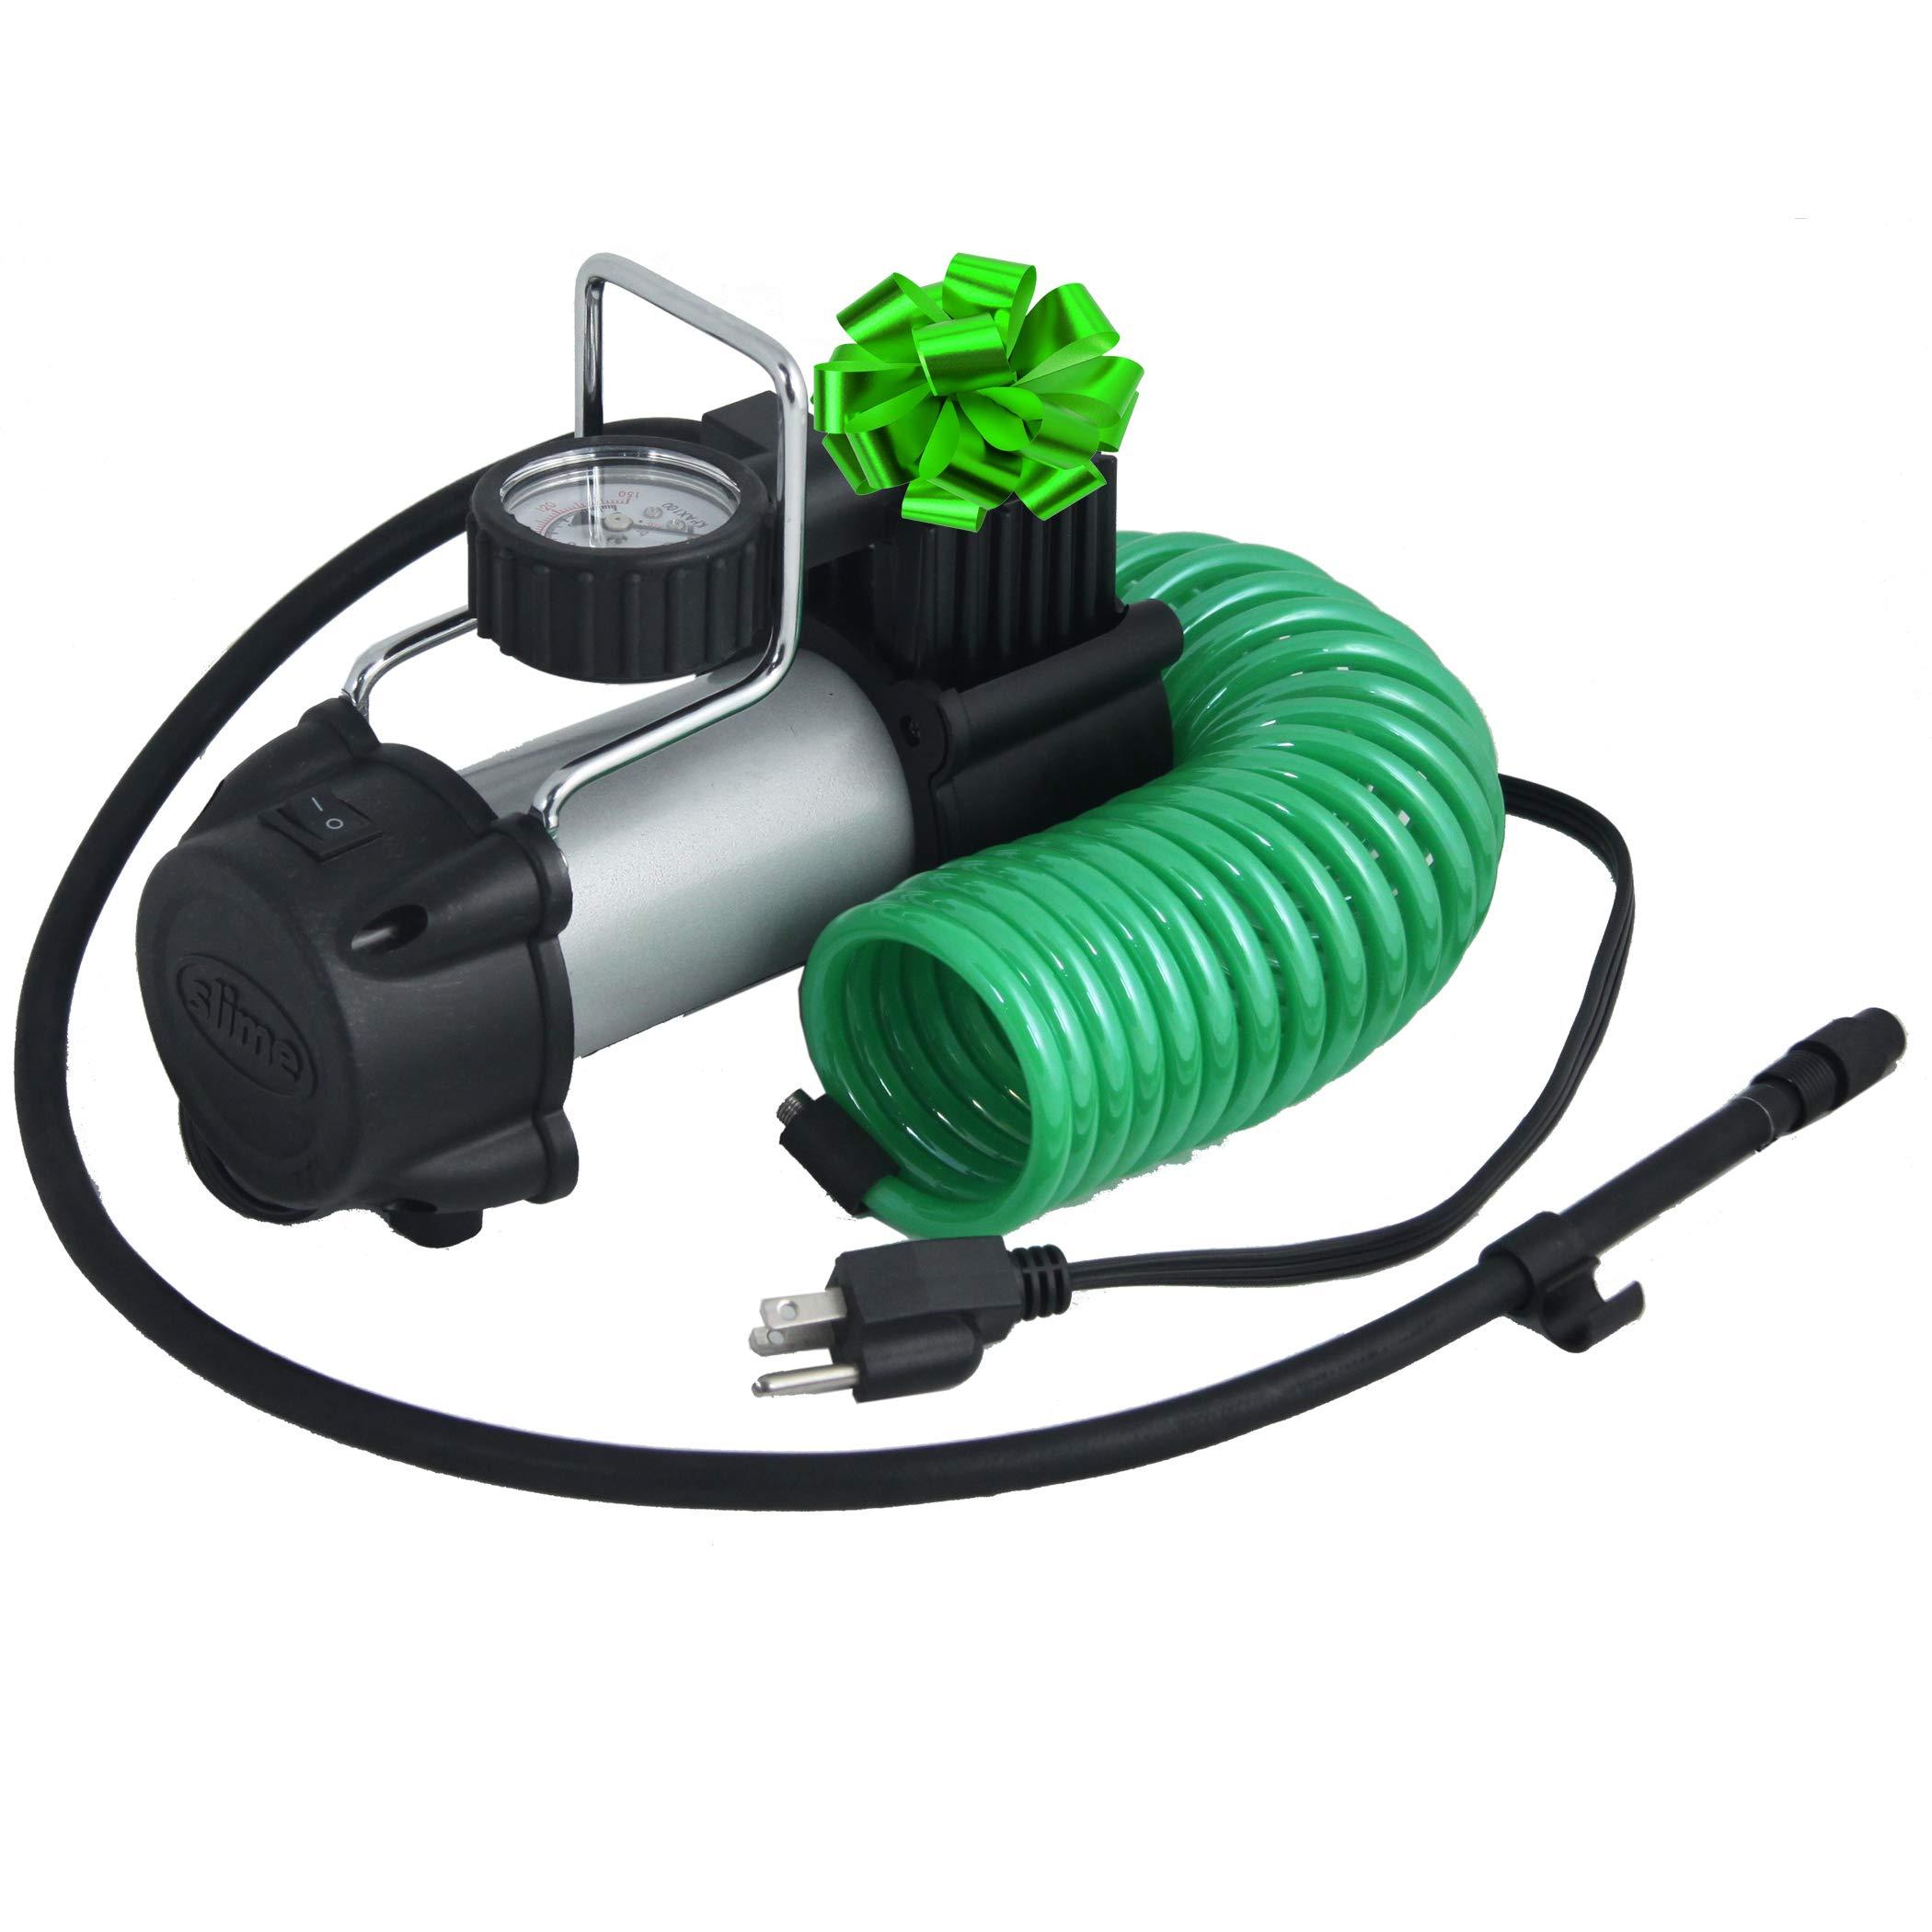 Slime 40045 Direct Drive Inflator